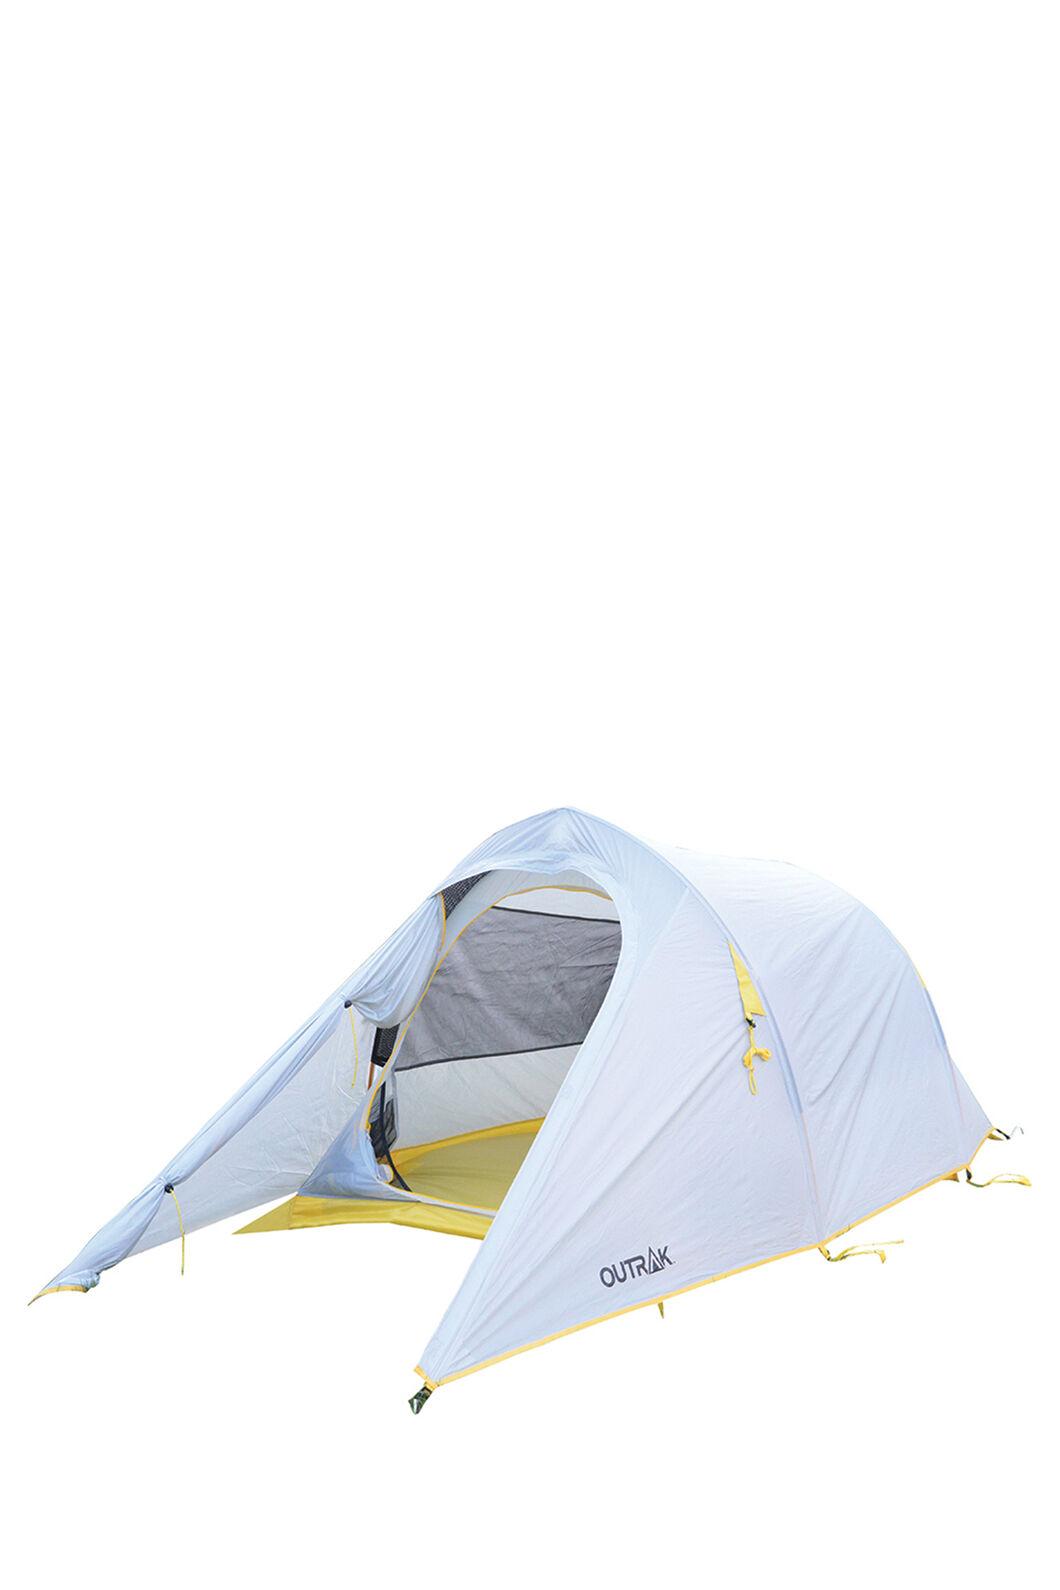 Outrak Jolt UL 2 Person Hiking Tent, None, hi-res